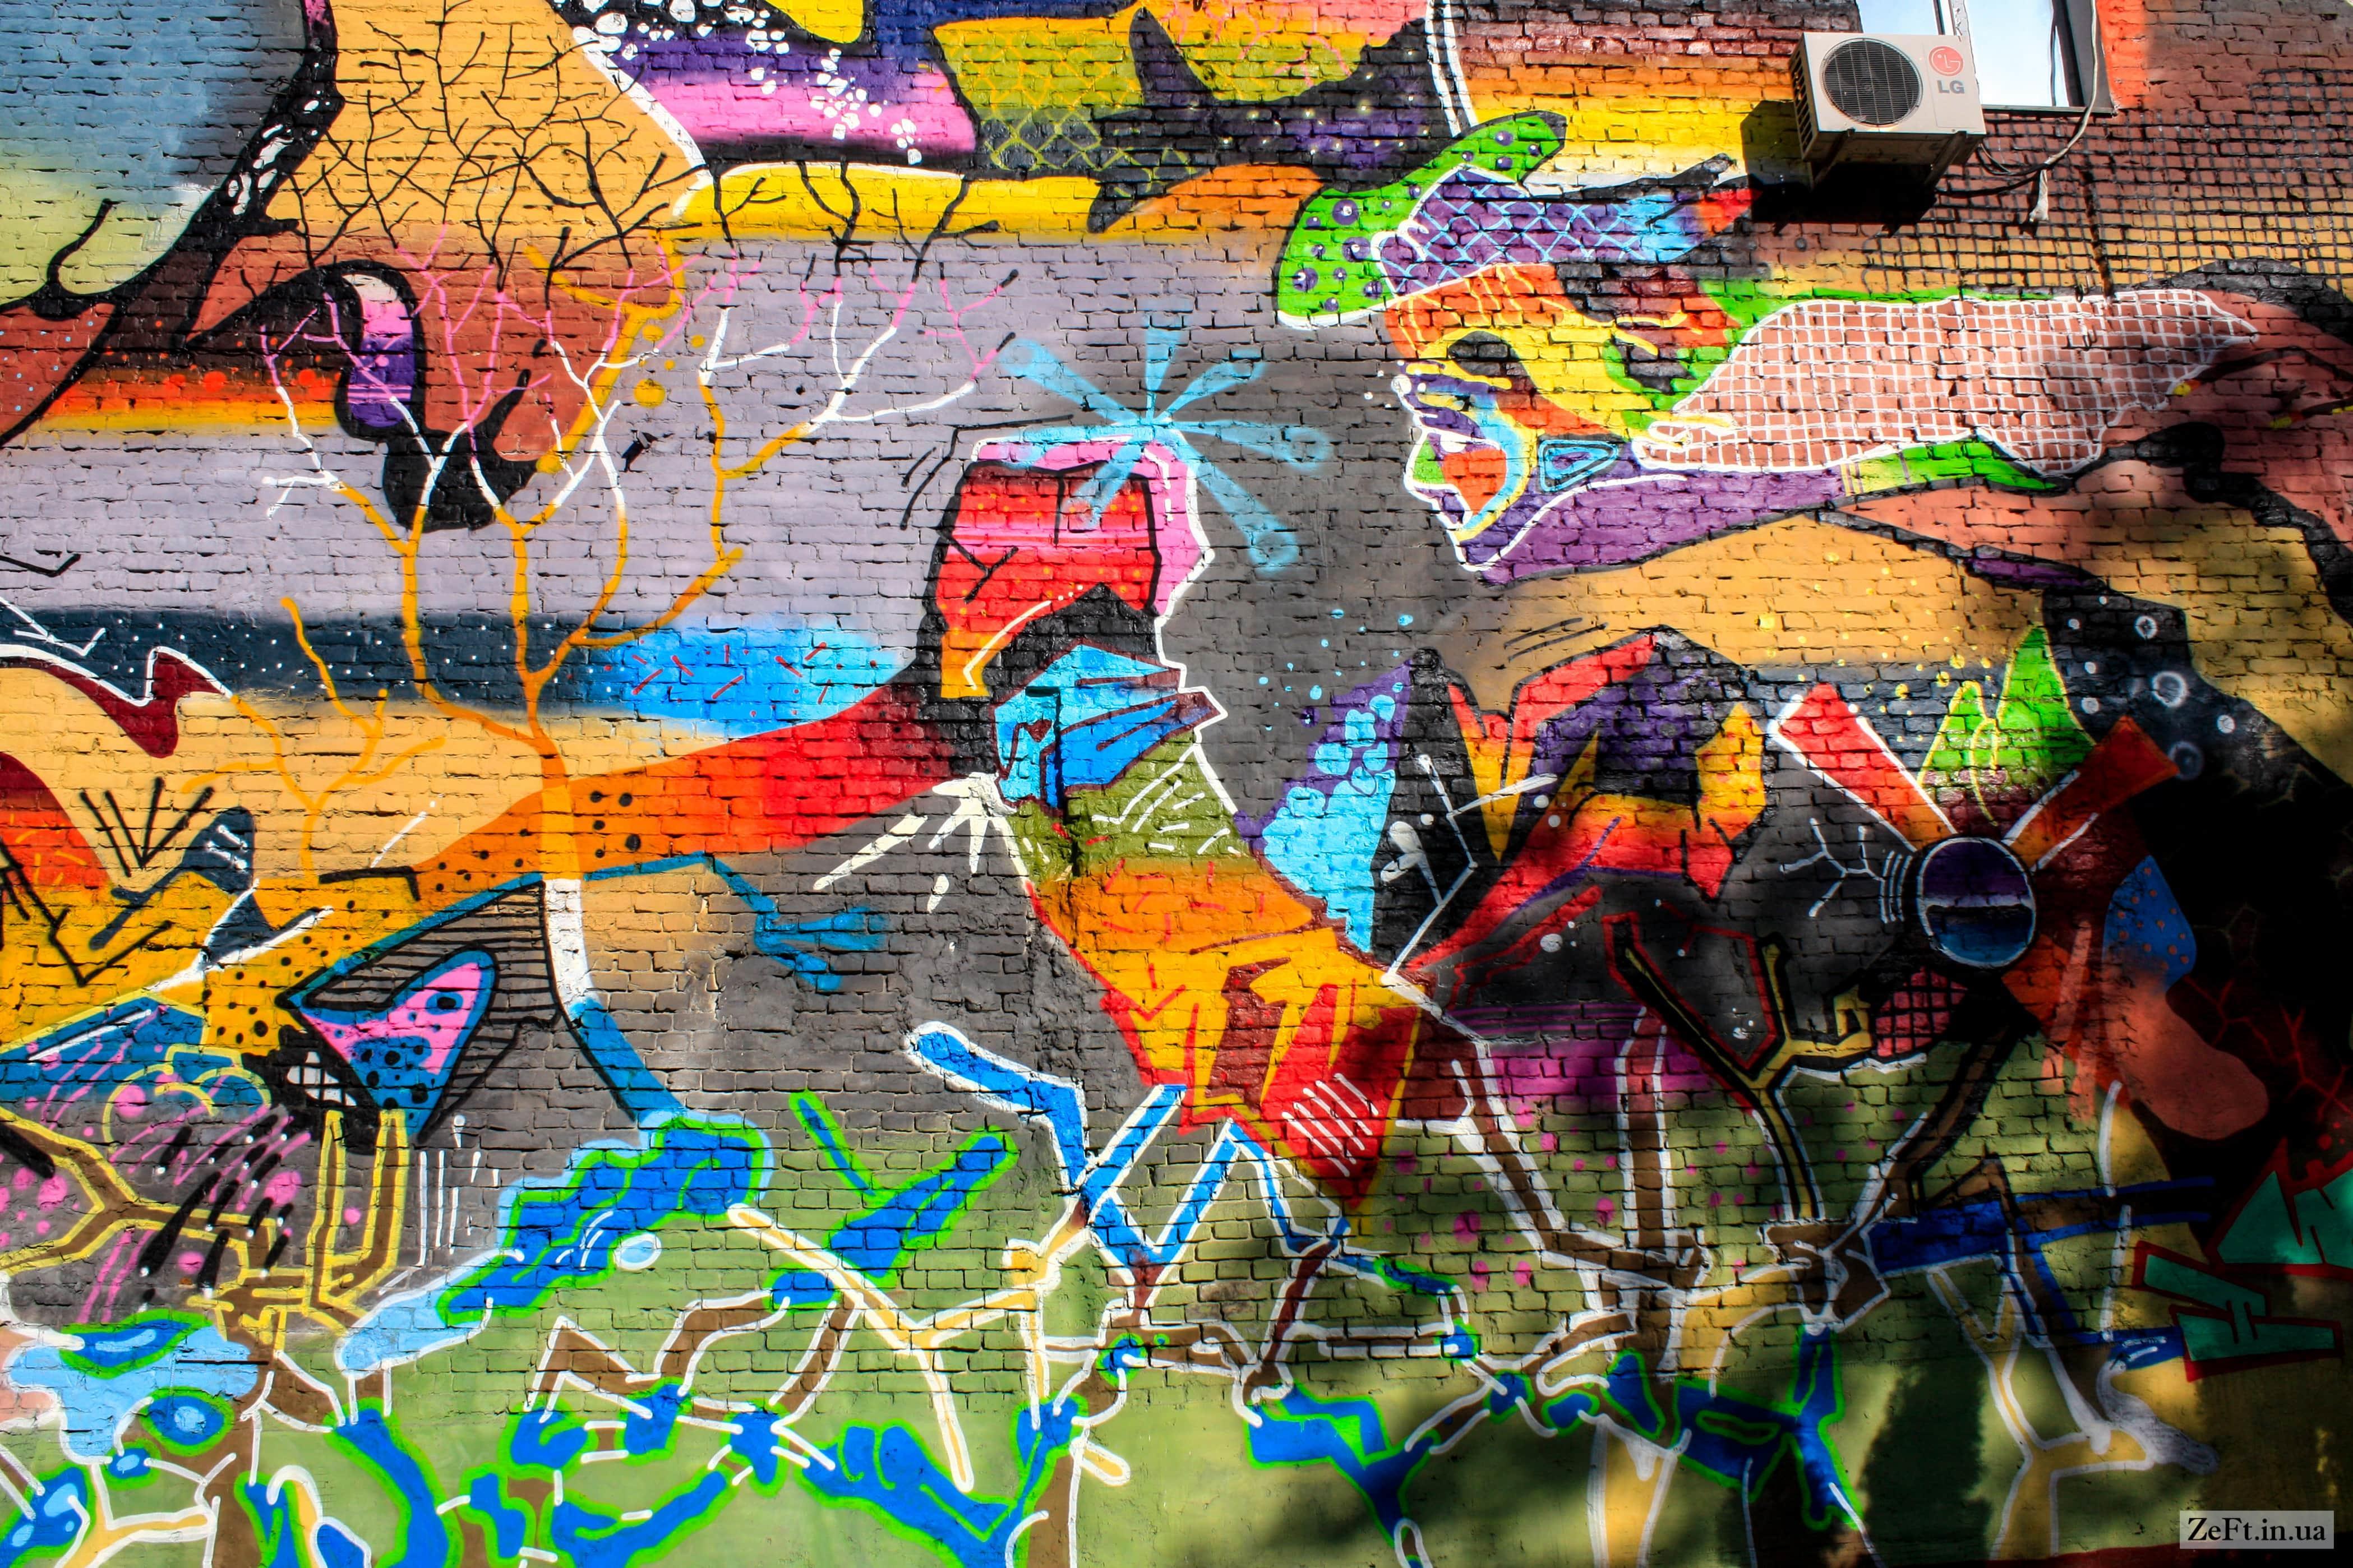 Urban Art and Graffiti Free Tour of Kiev